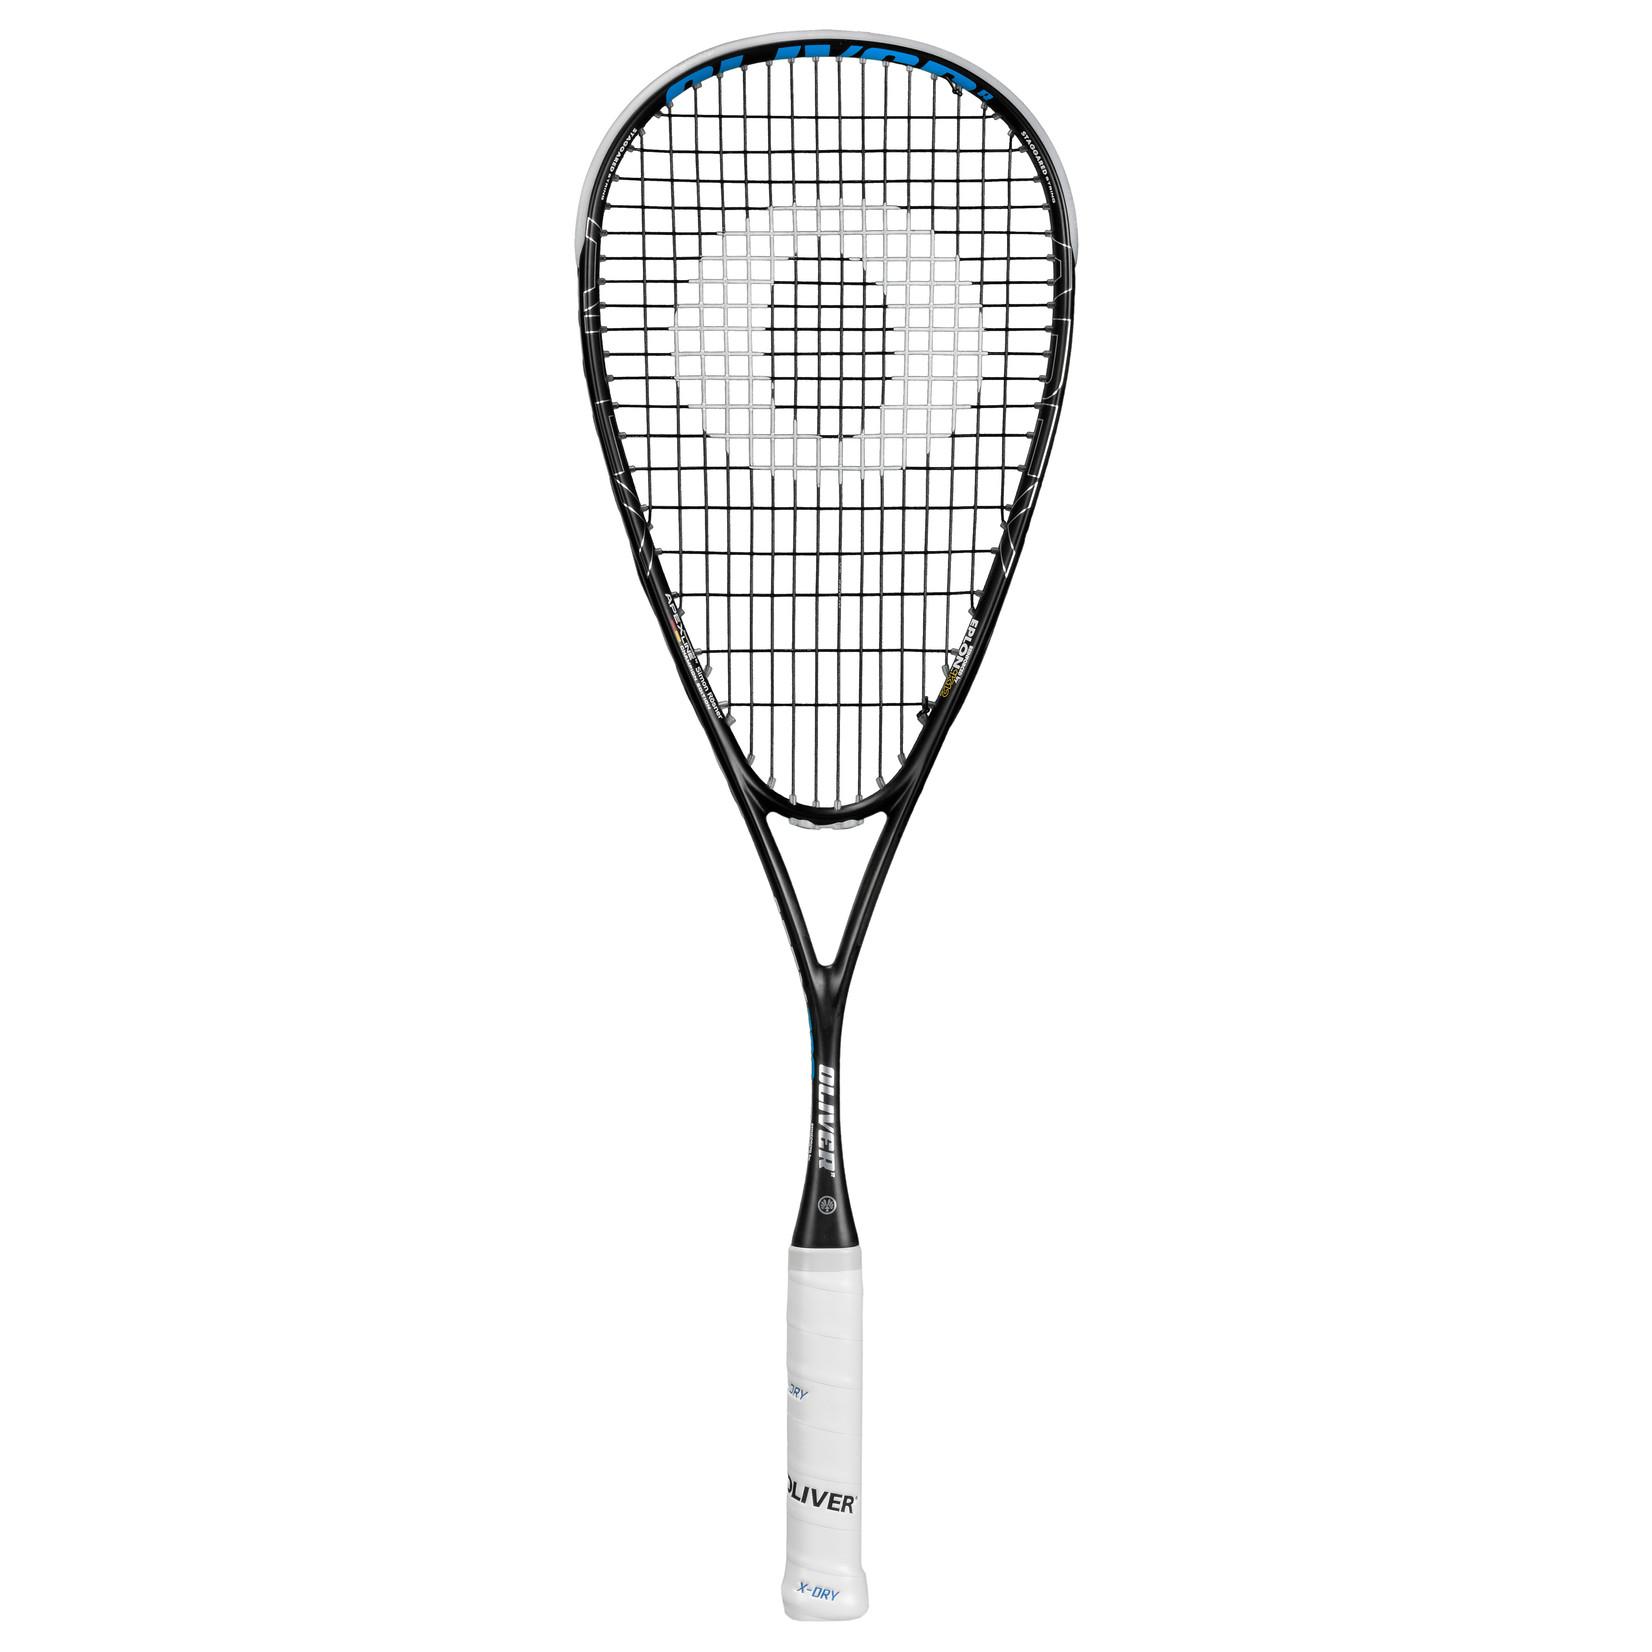 Oliver Apex 700 squashracket